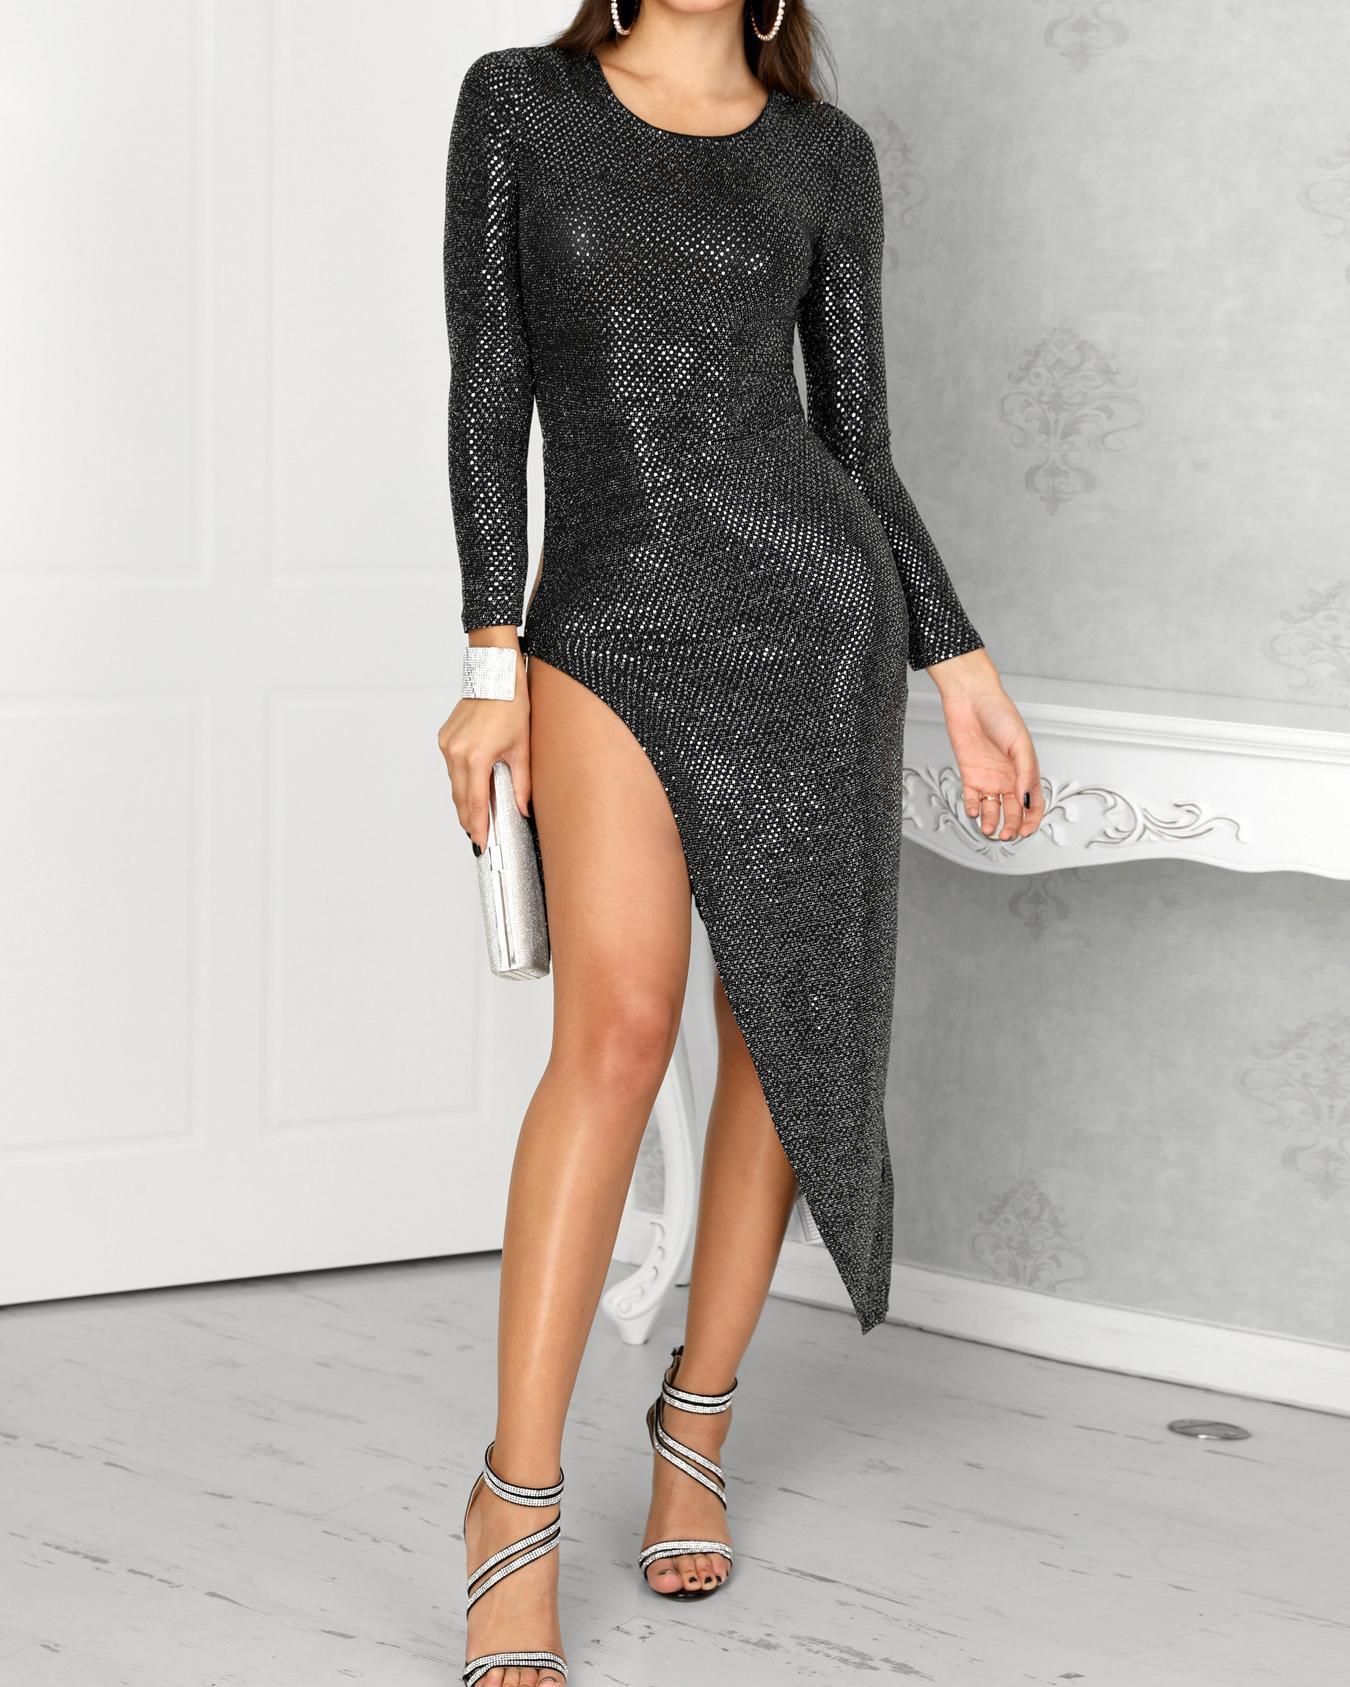 Shiny Knot Side High Slit Irregular Party Dress фото